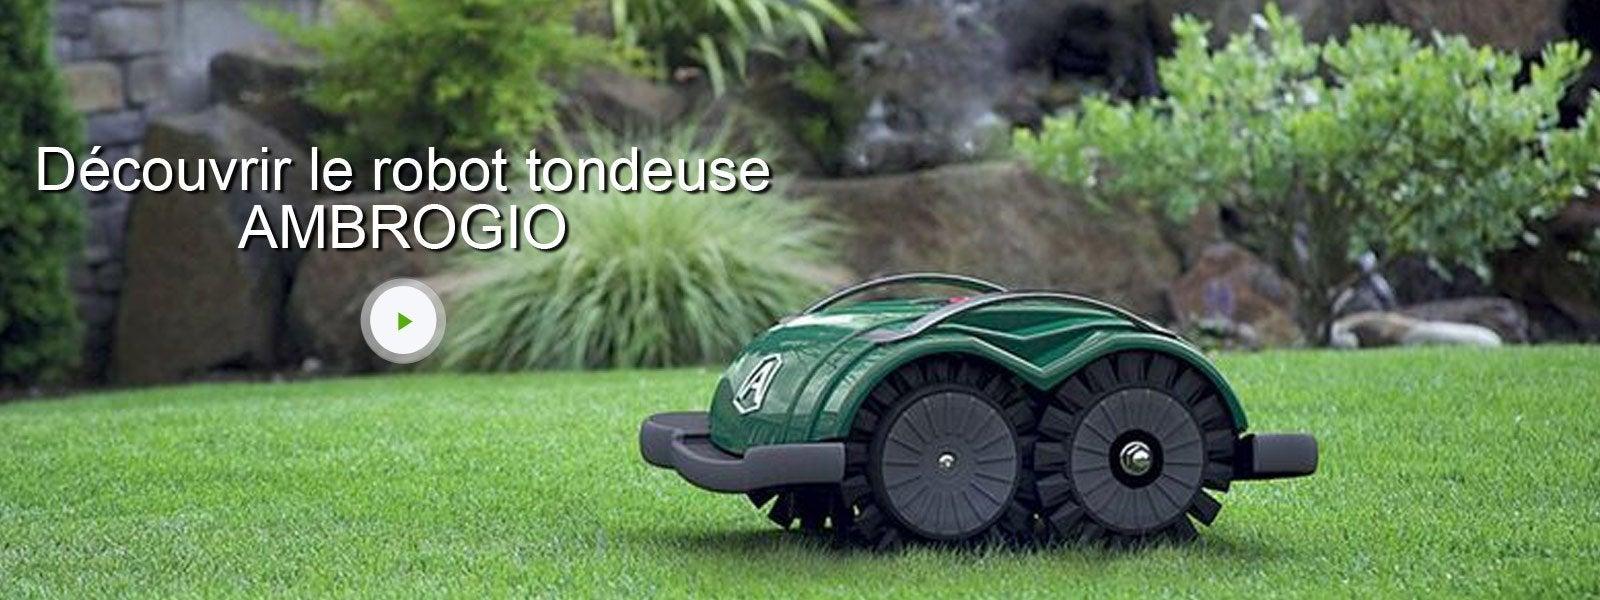 tondeuse robot ambrogio l60 200 m leroy merlin. Black Bedroom Furniture Sets. Home Design Ideas